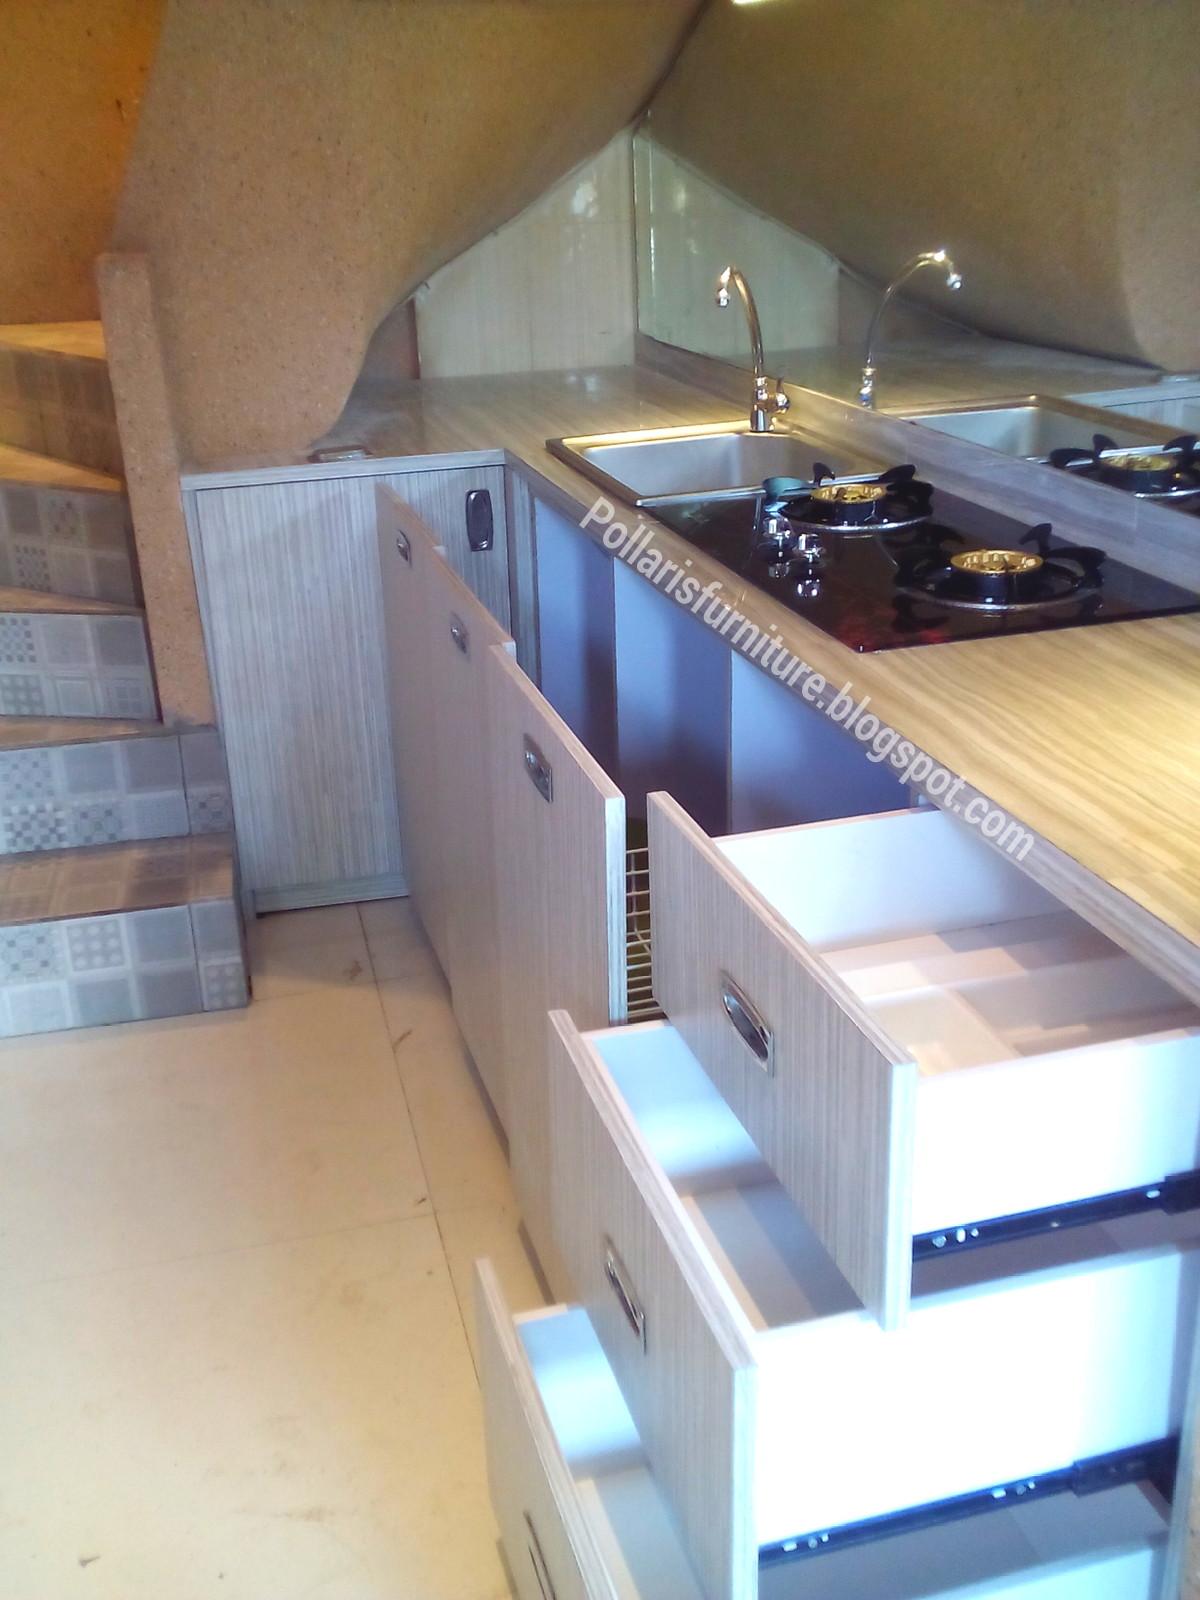 Menerima Jasa Pembuatan Furniture Kitchen Setbackdropp Bedroom Set Living Room Kantor Apartemen Hotel Dll